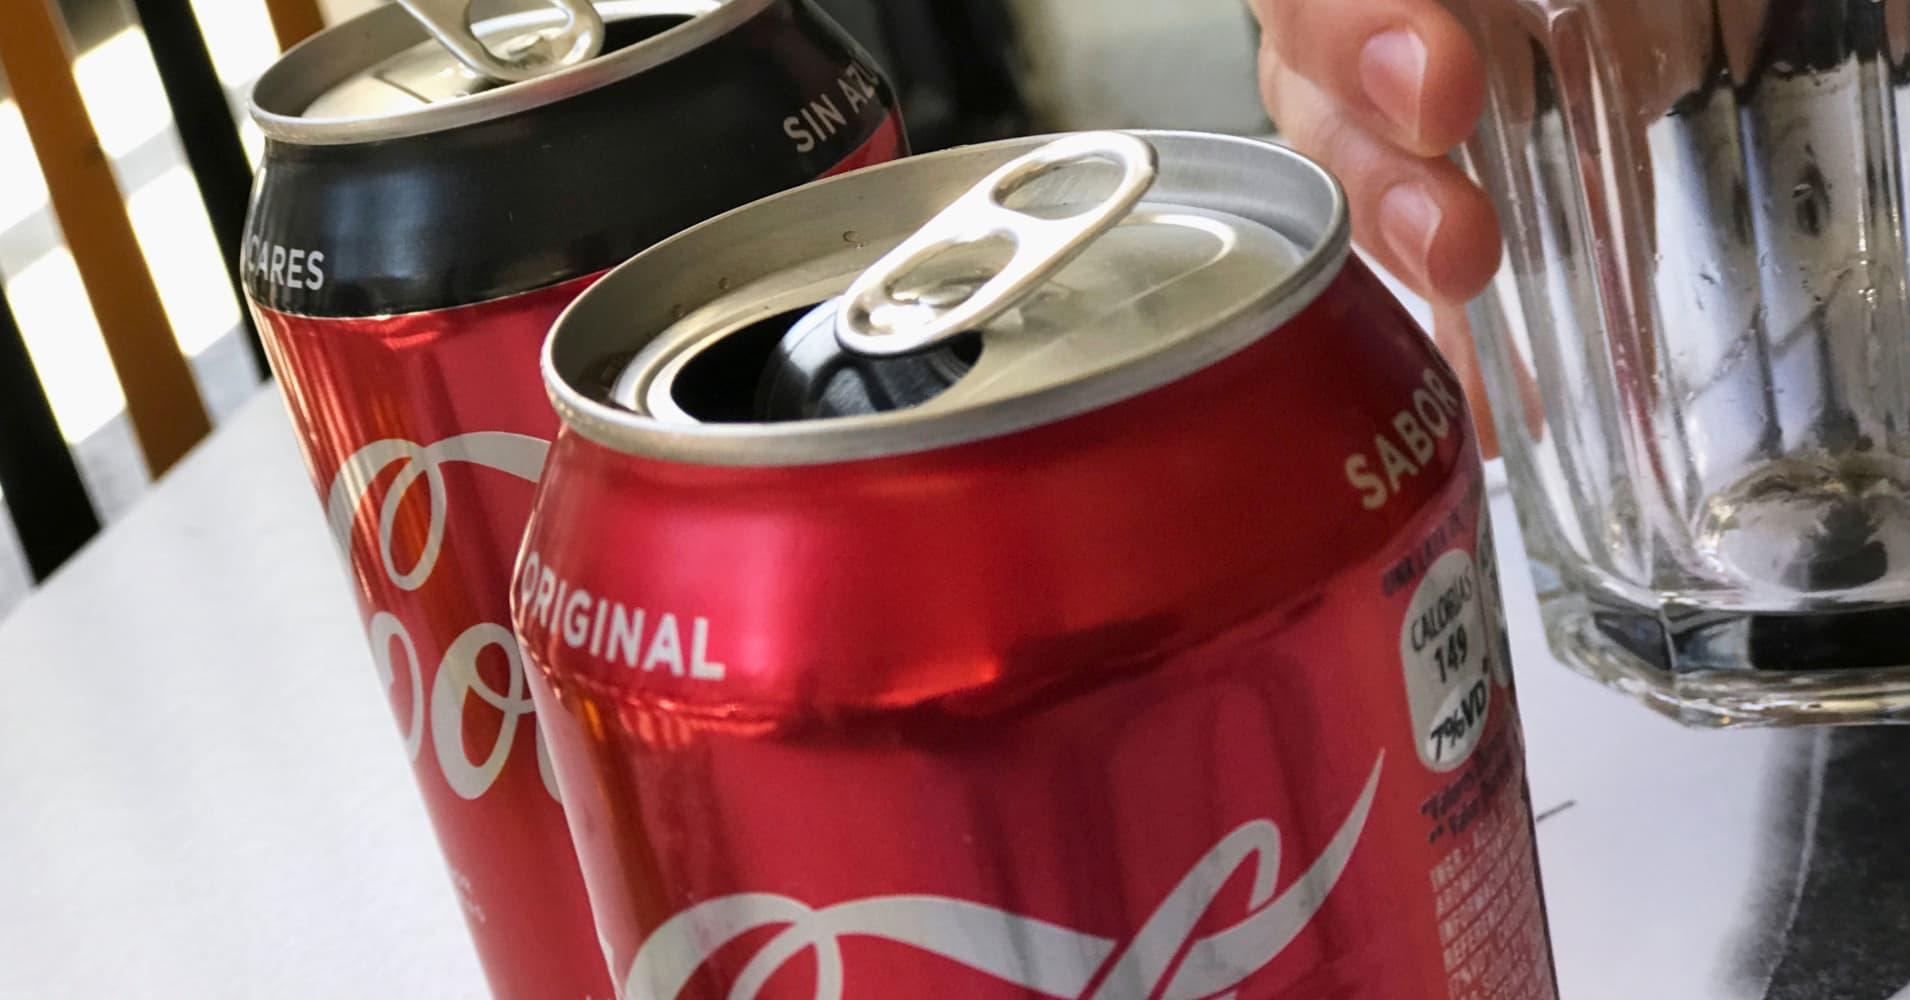 Greetings, death: Coca-Cola's marketing slogan backfires badly in New Zealand